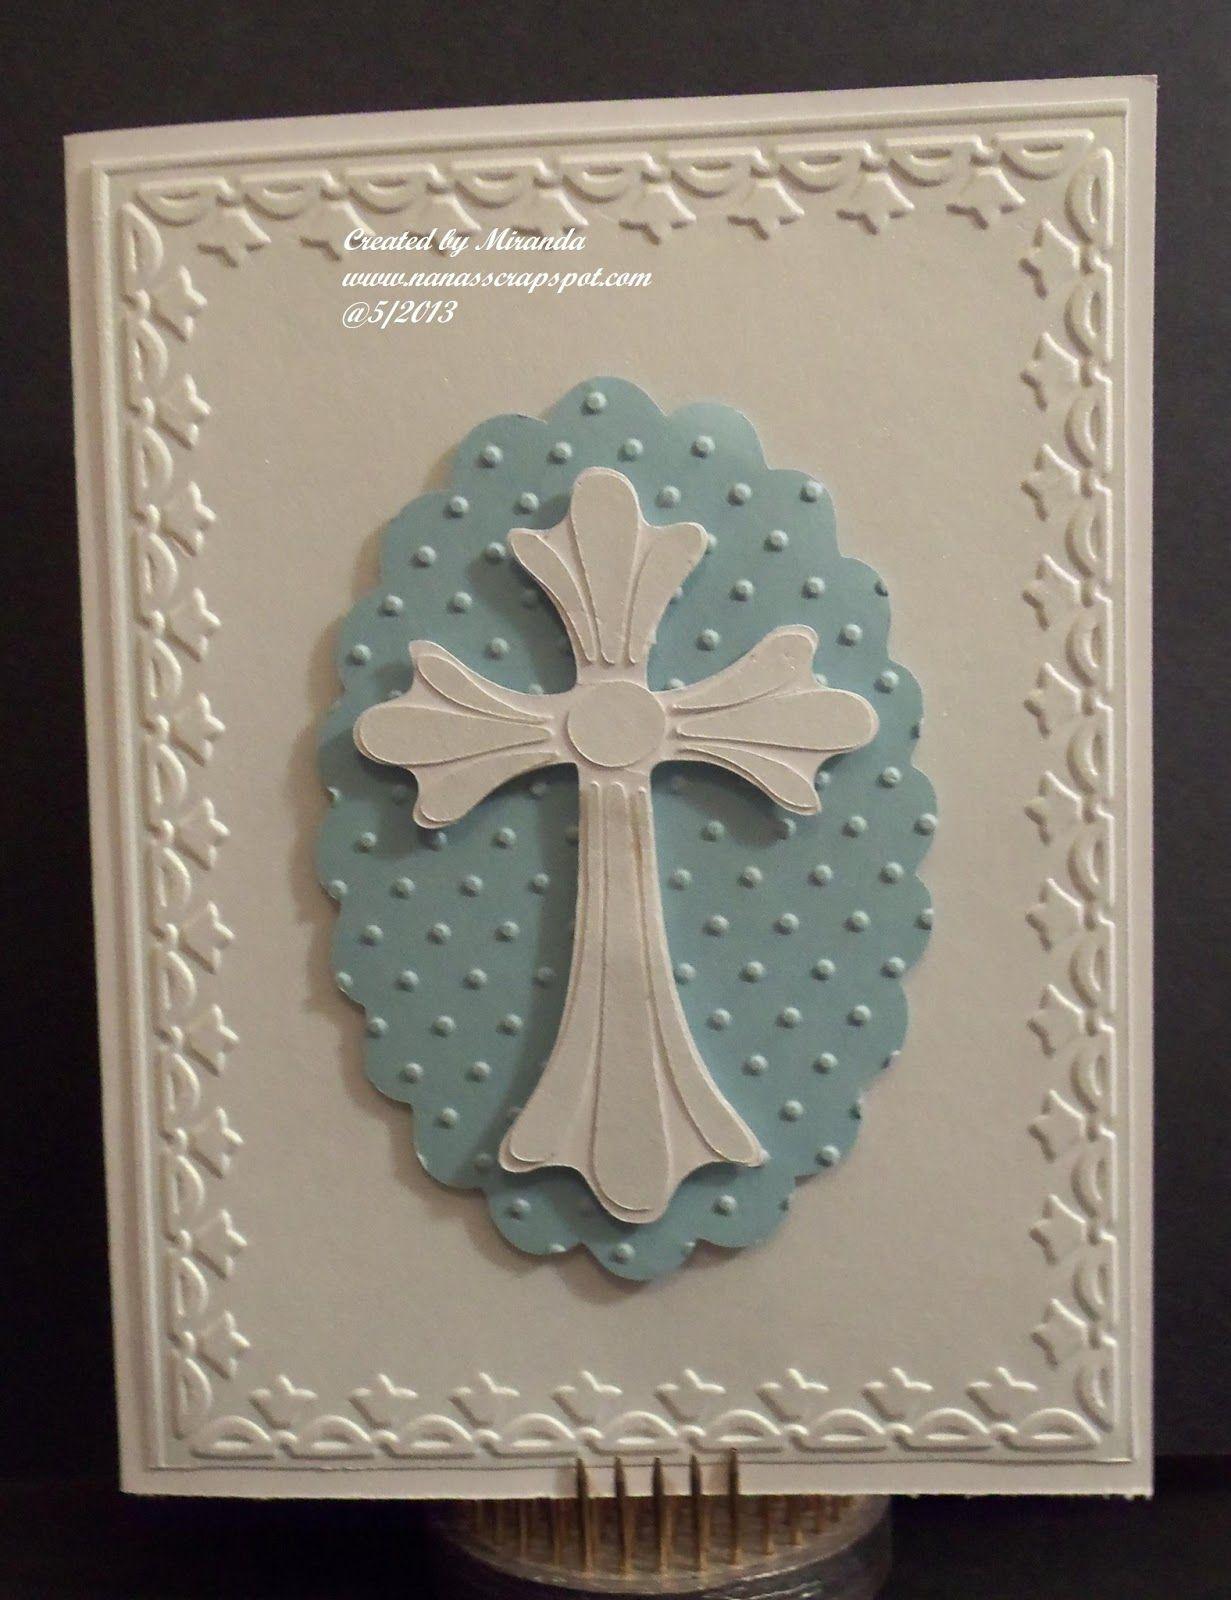 точки зрения открытка своими руками на крещение начале века